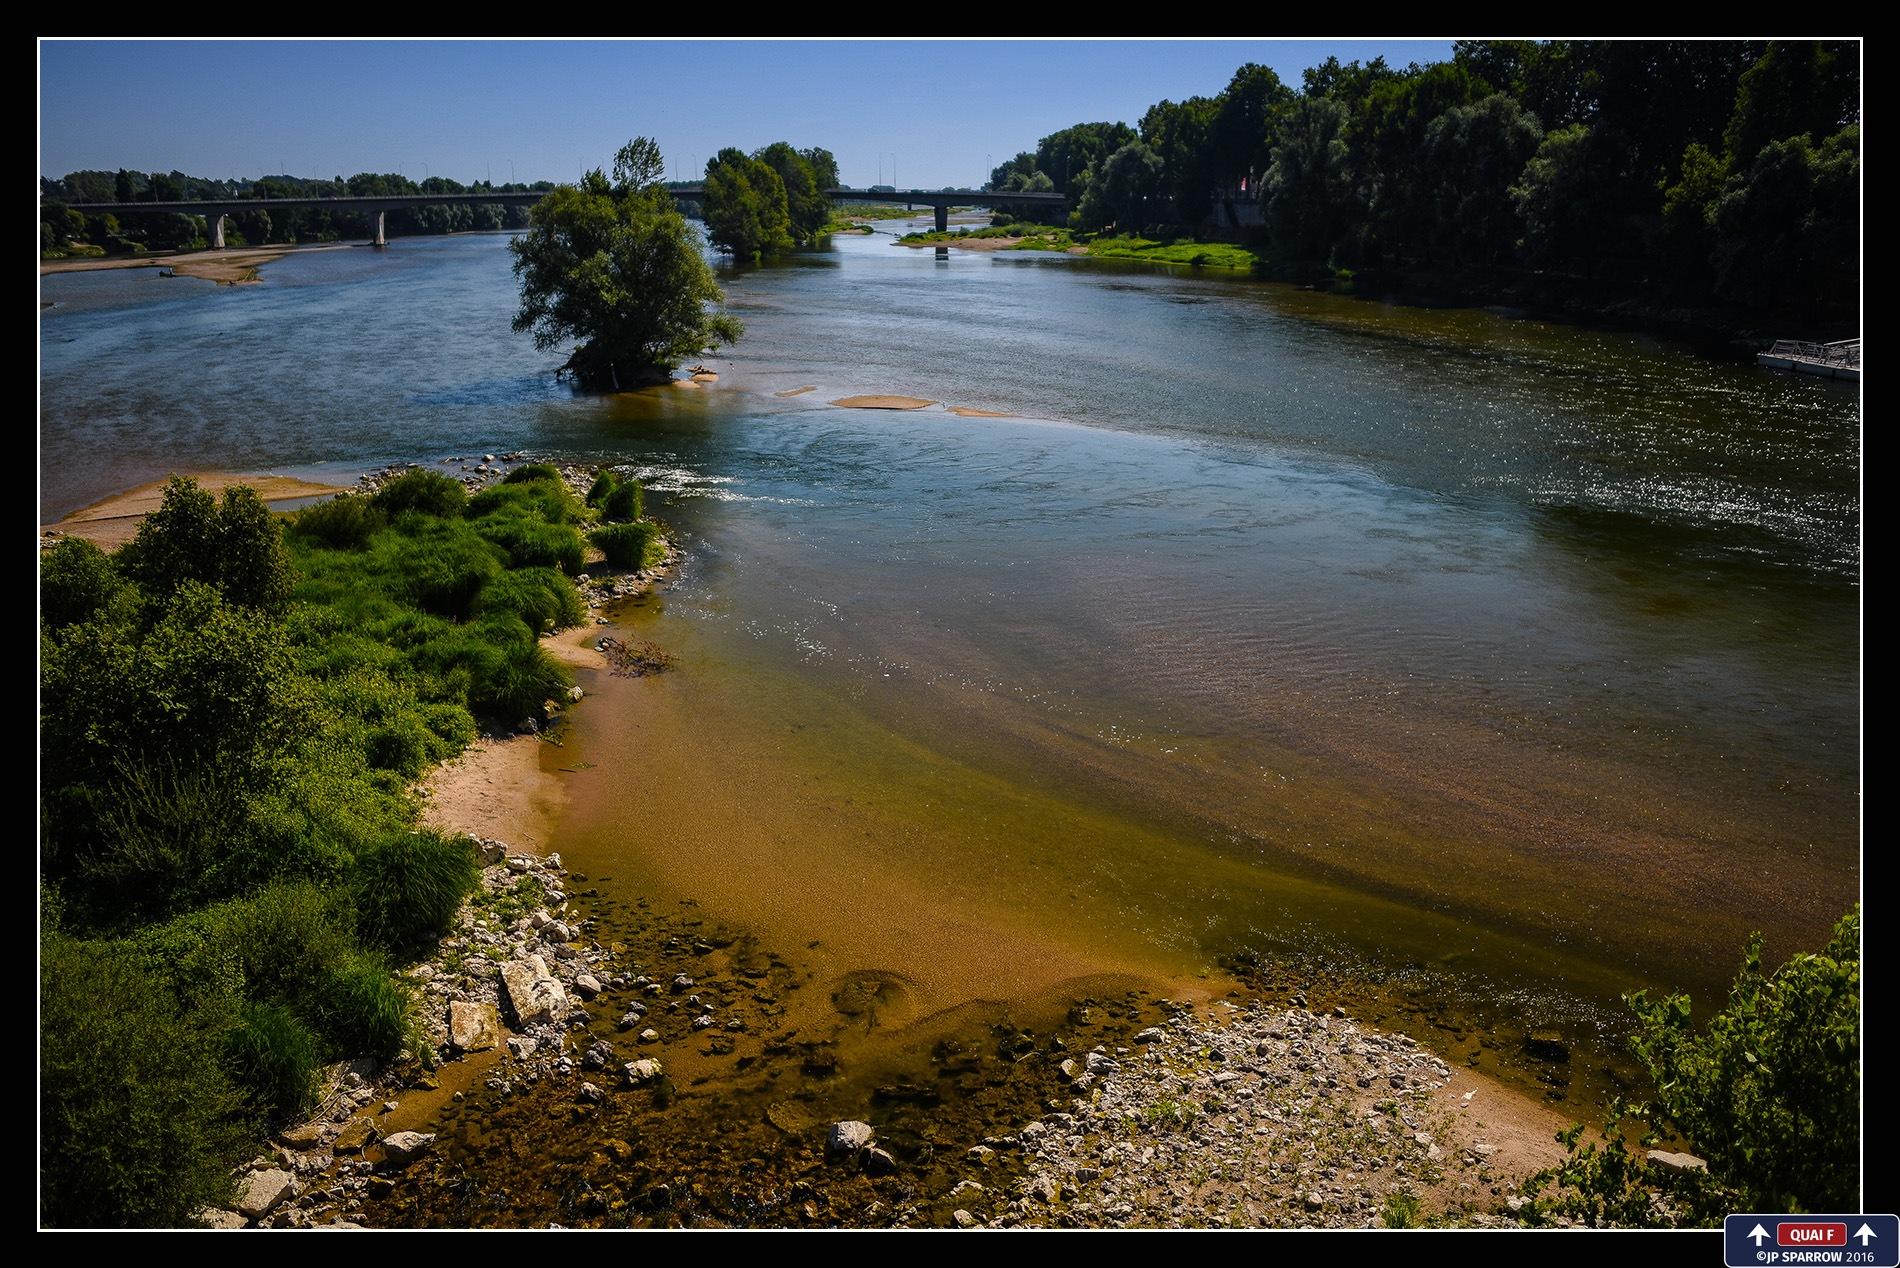 France - Loire Valley by GRAFFICSTUDIOS - JP SPARROW